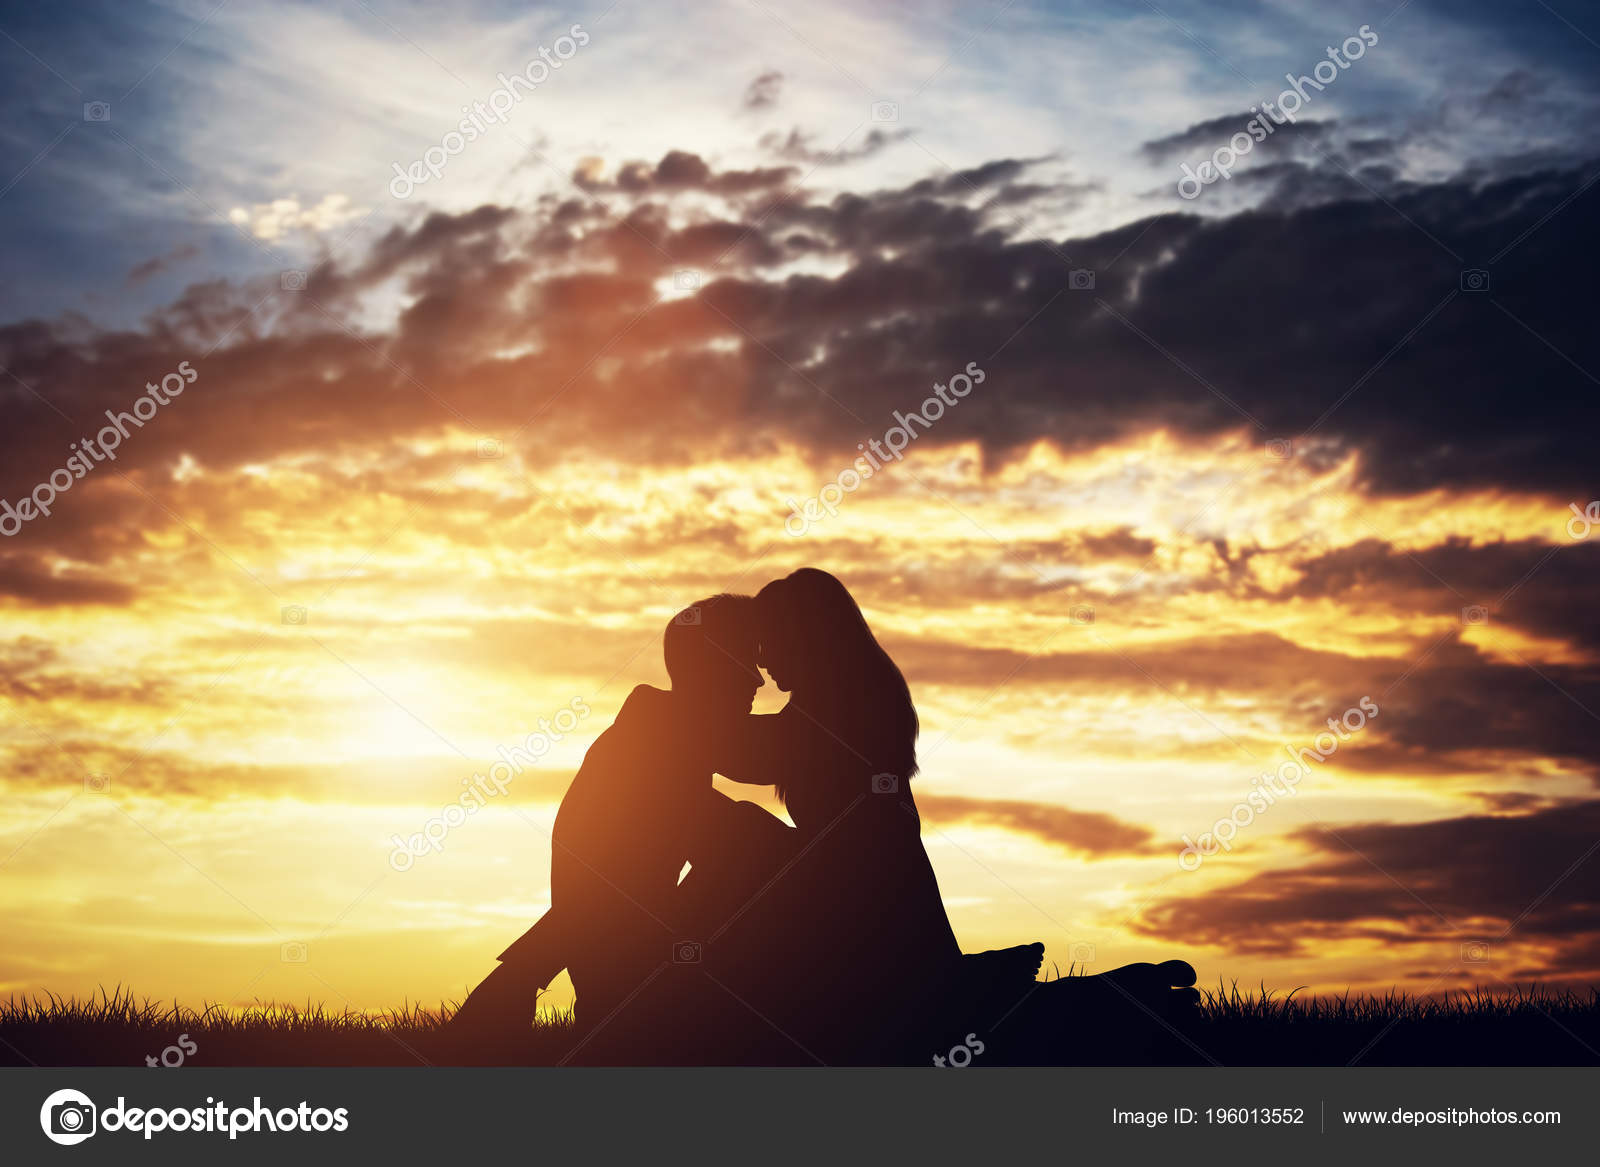 imágenes pareja enamorados siluetas pareja enamorados sentados